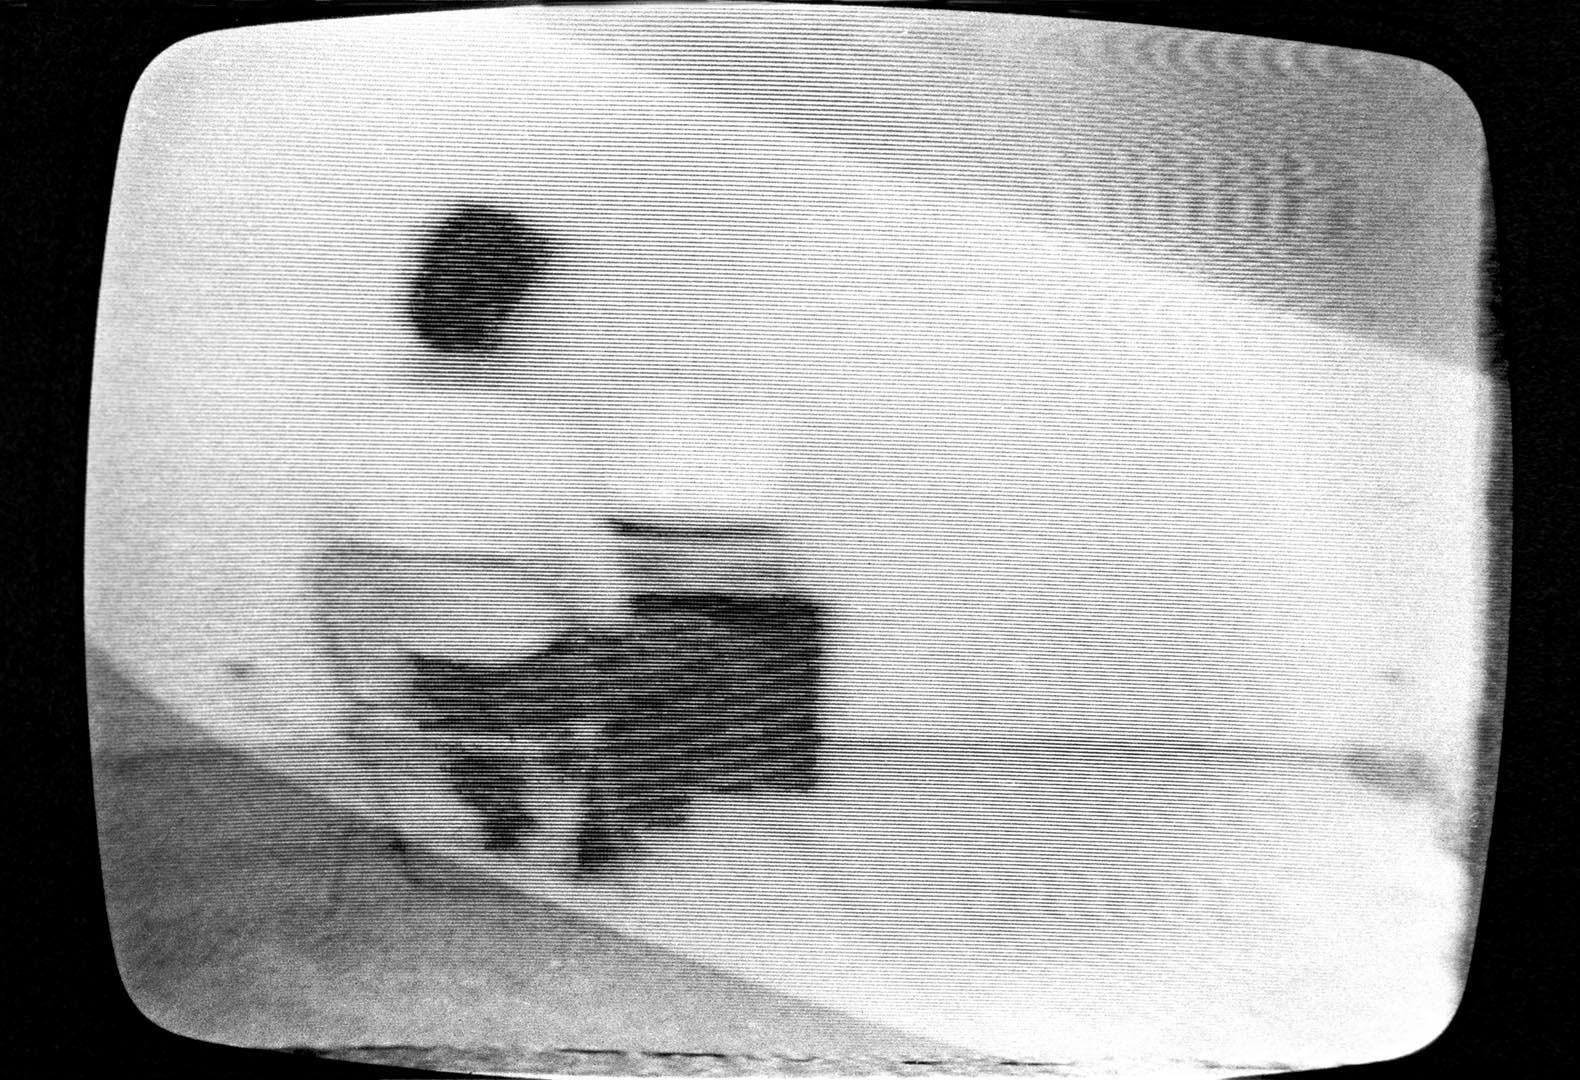 07-44-49a.jpg